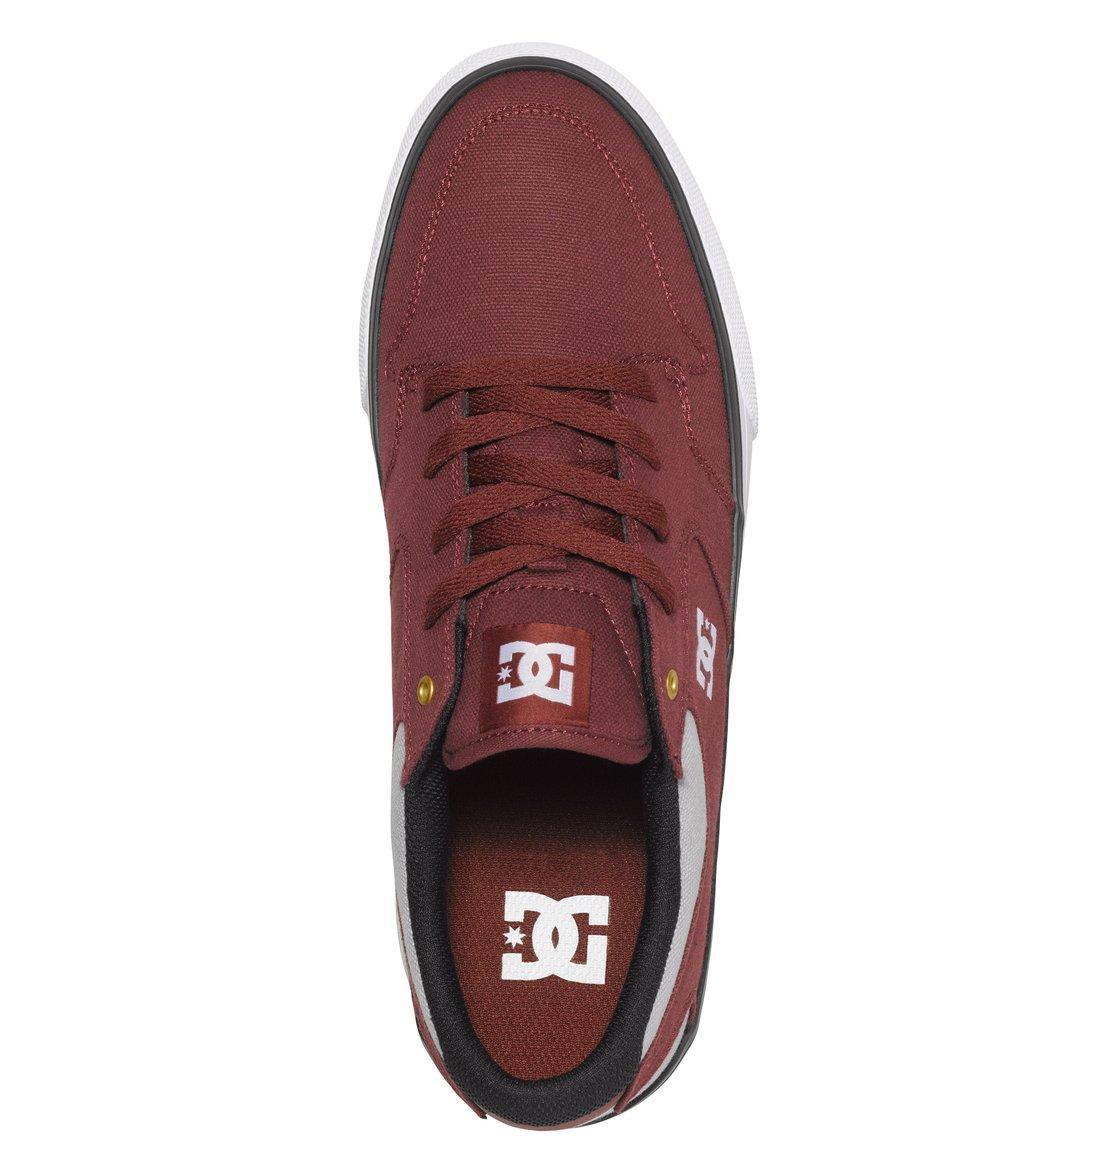 Argosy Vulc TX - Low-Top Shoes ADYS300343   DC Shoes 461da115fe